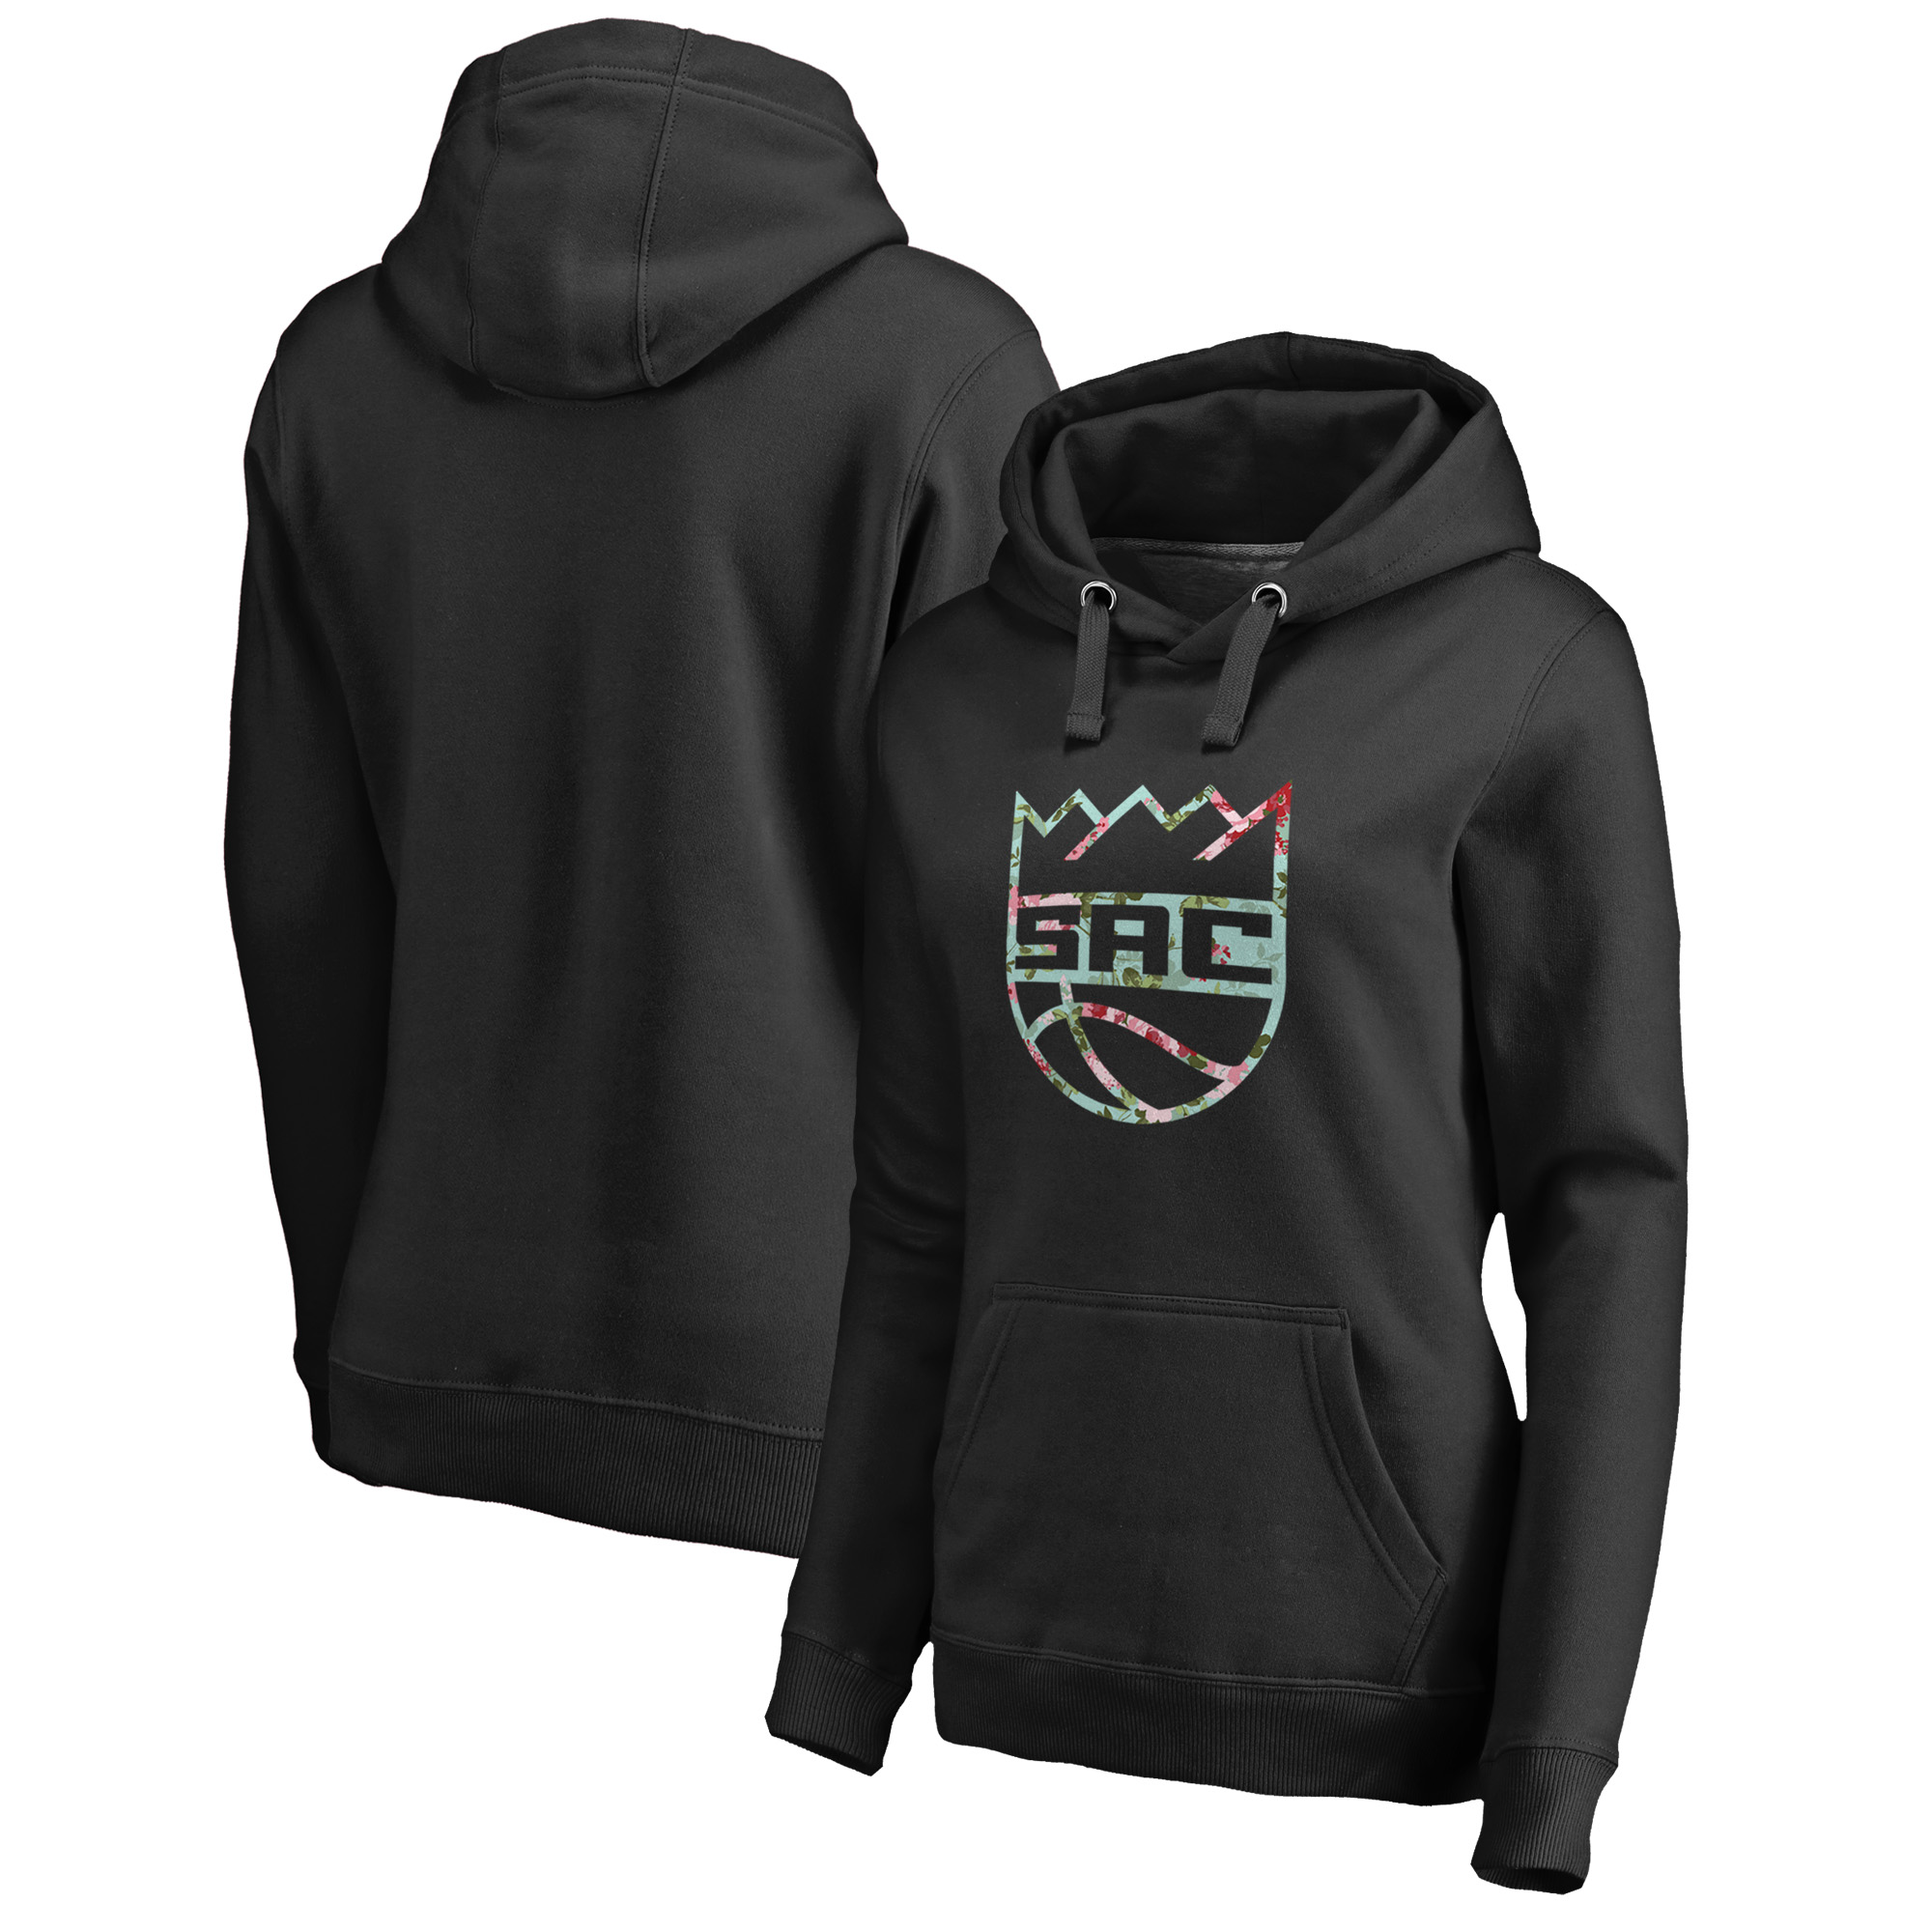 Sacramento Kings Fanatics Branded Women's Lovely Pullover Hoodie - Black